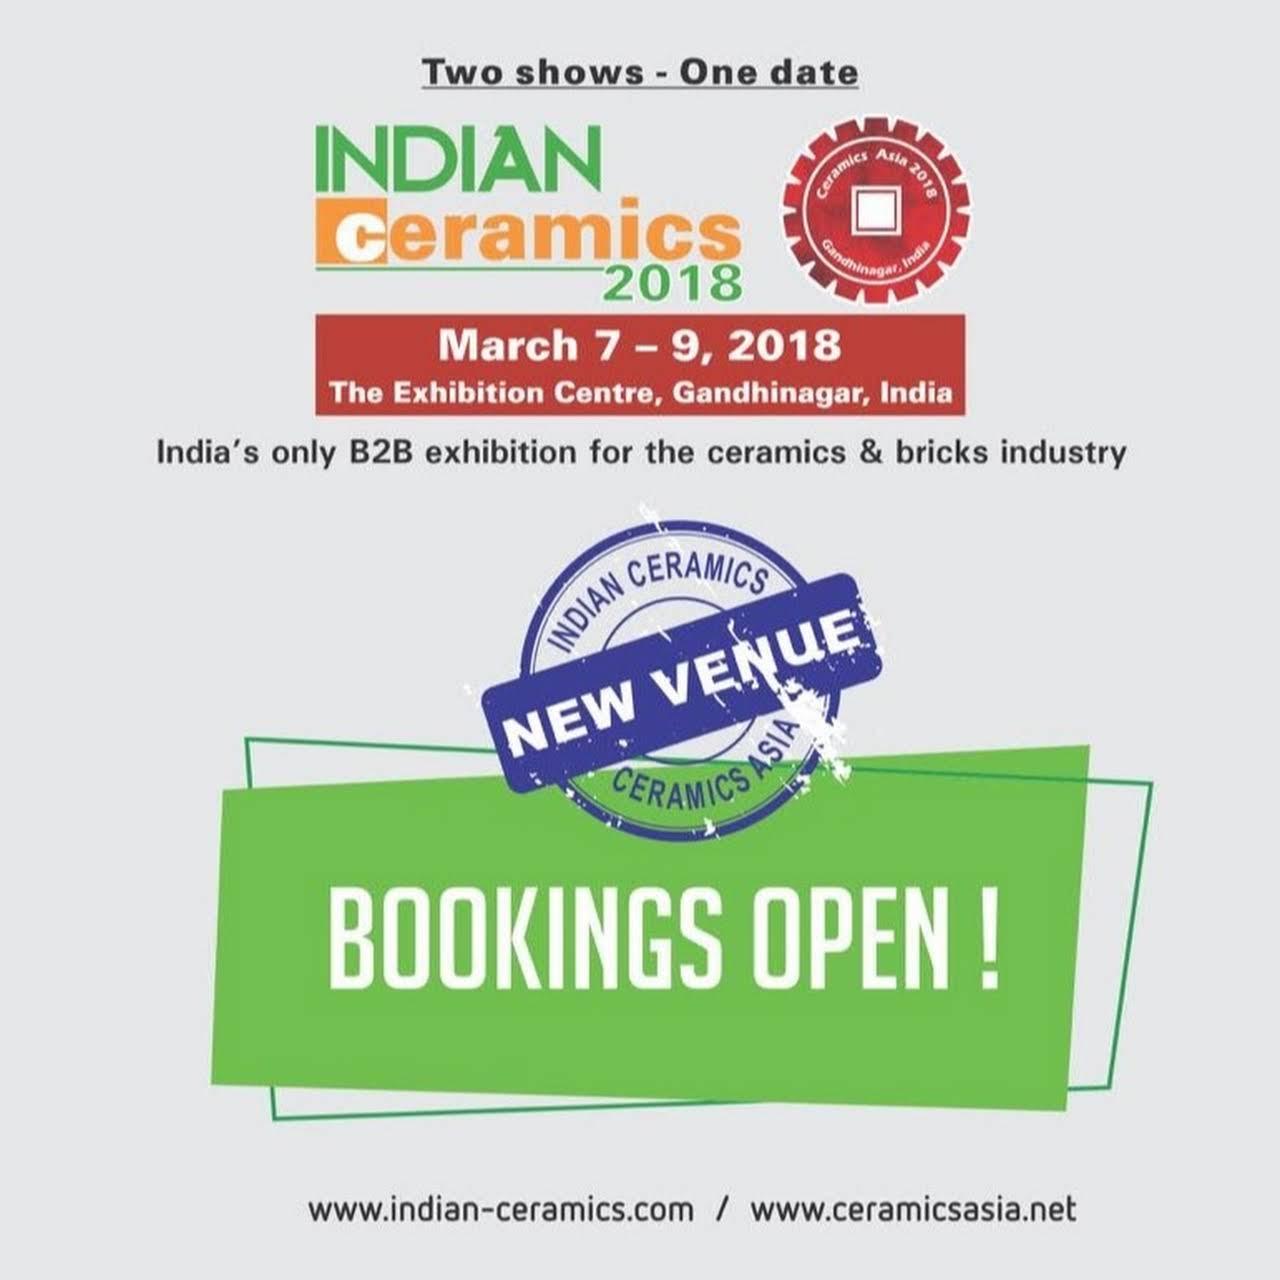 Indian Ceramics - Business to Business Service in Gandhinagar, Gujarat